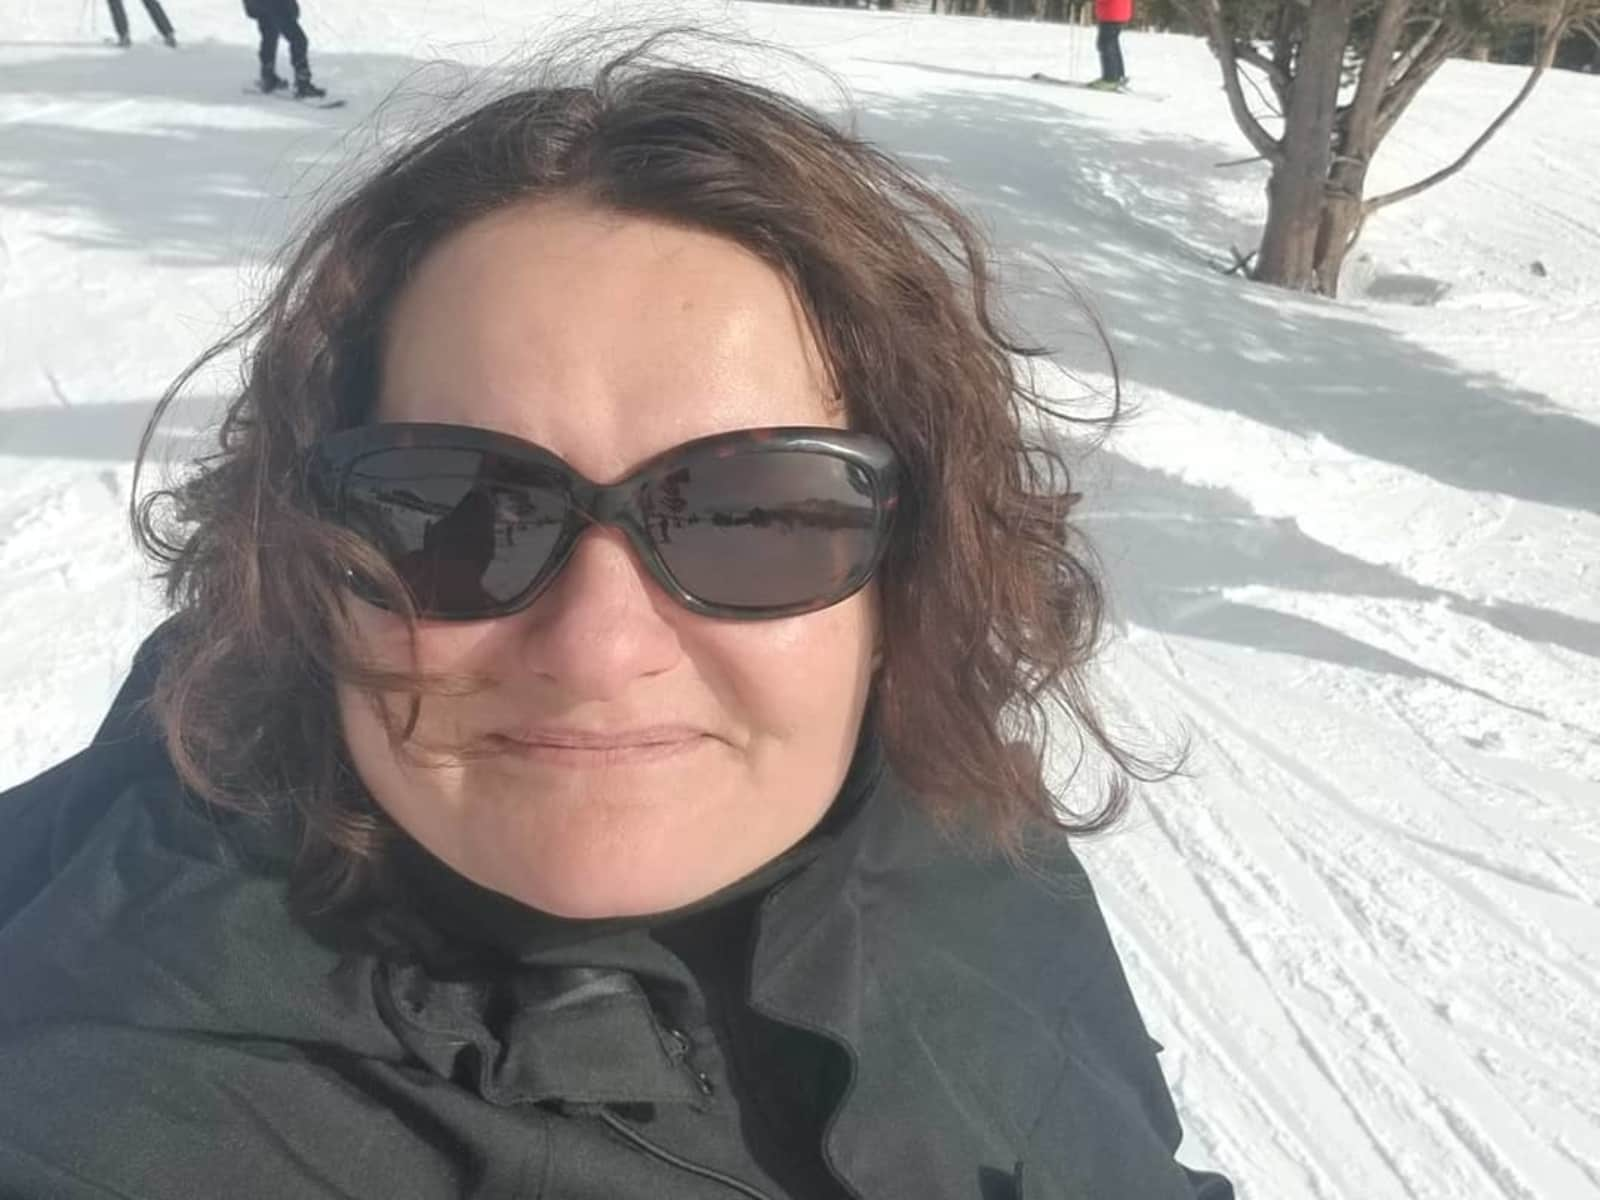 Stephanie hamilton from Colorado Springs, Colorado, United States